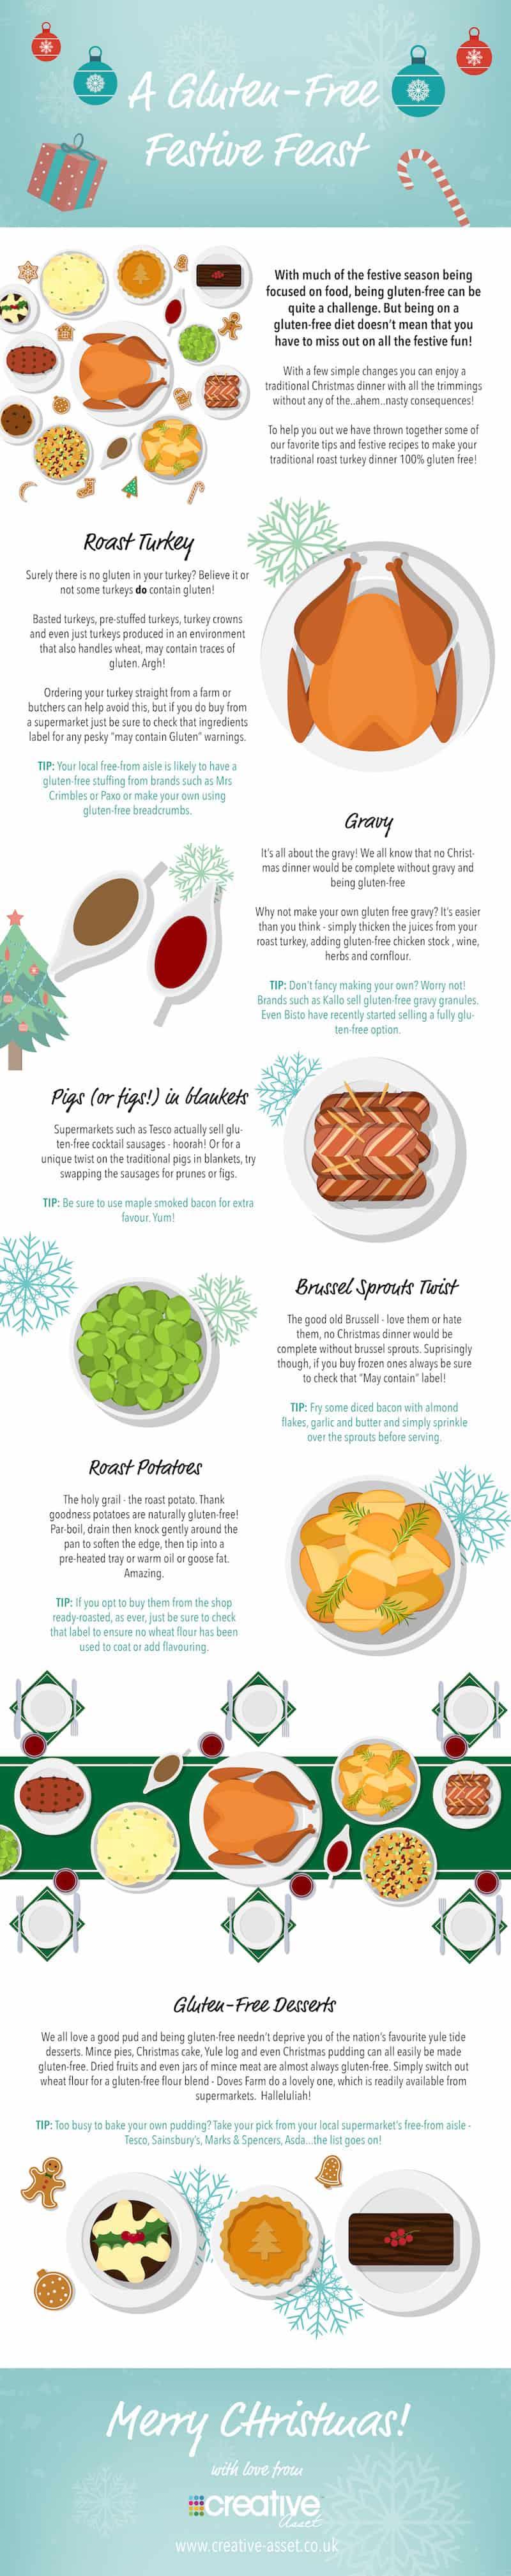 Gluten Free Christmas Infographic